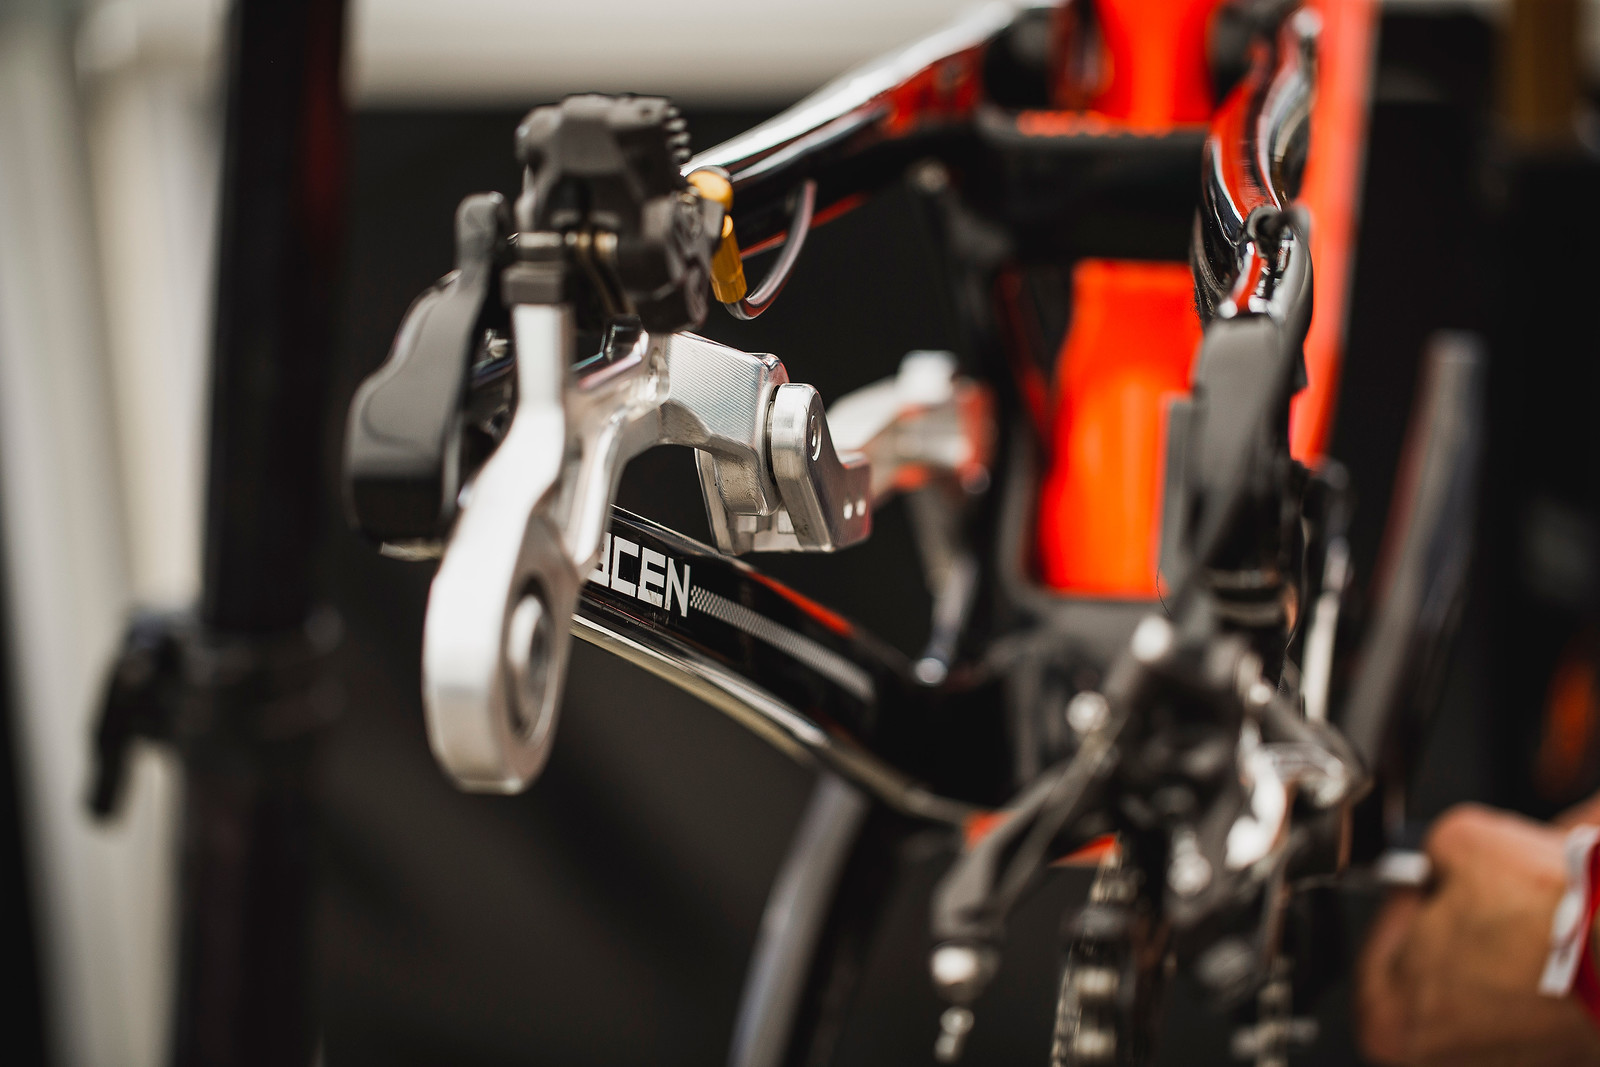 Floating Brake on Saracen - PIT BITS - ANDORRA WORLD CUP DOWNHILL - Mountain Biking Pictures - Vital MTB